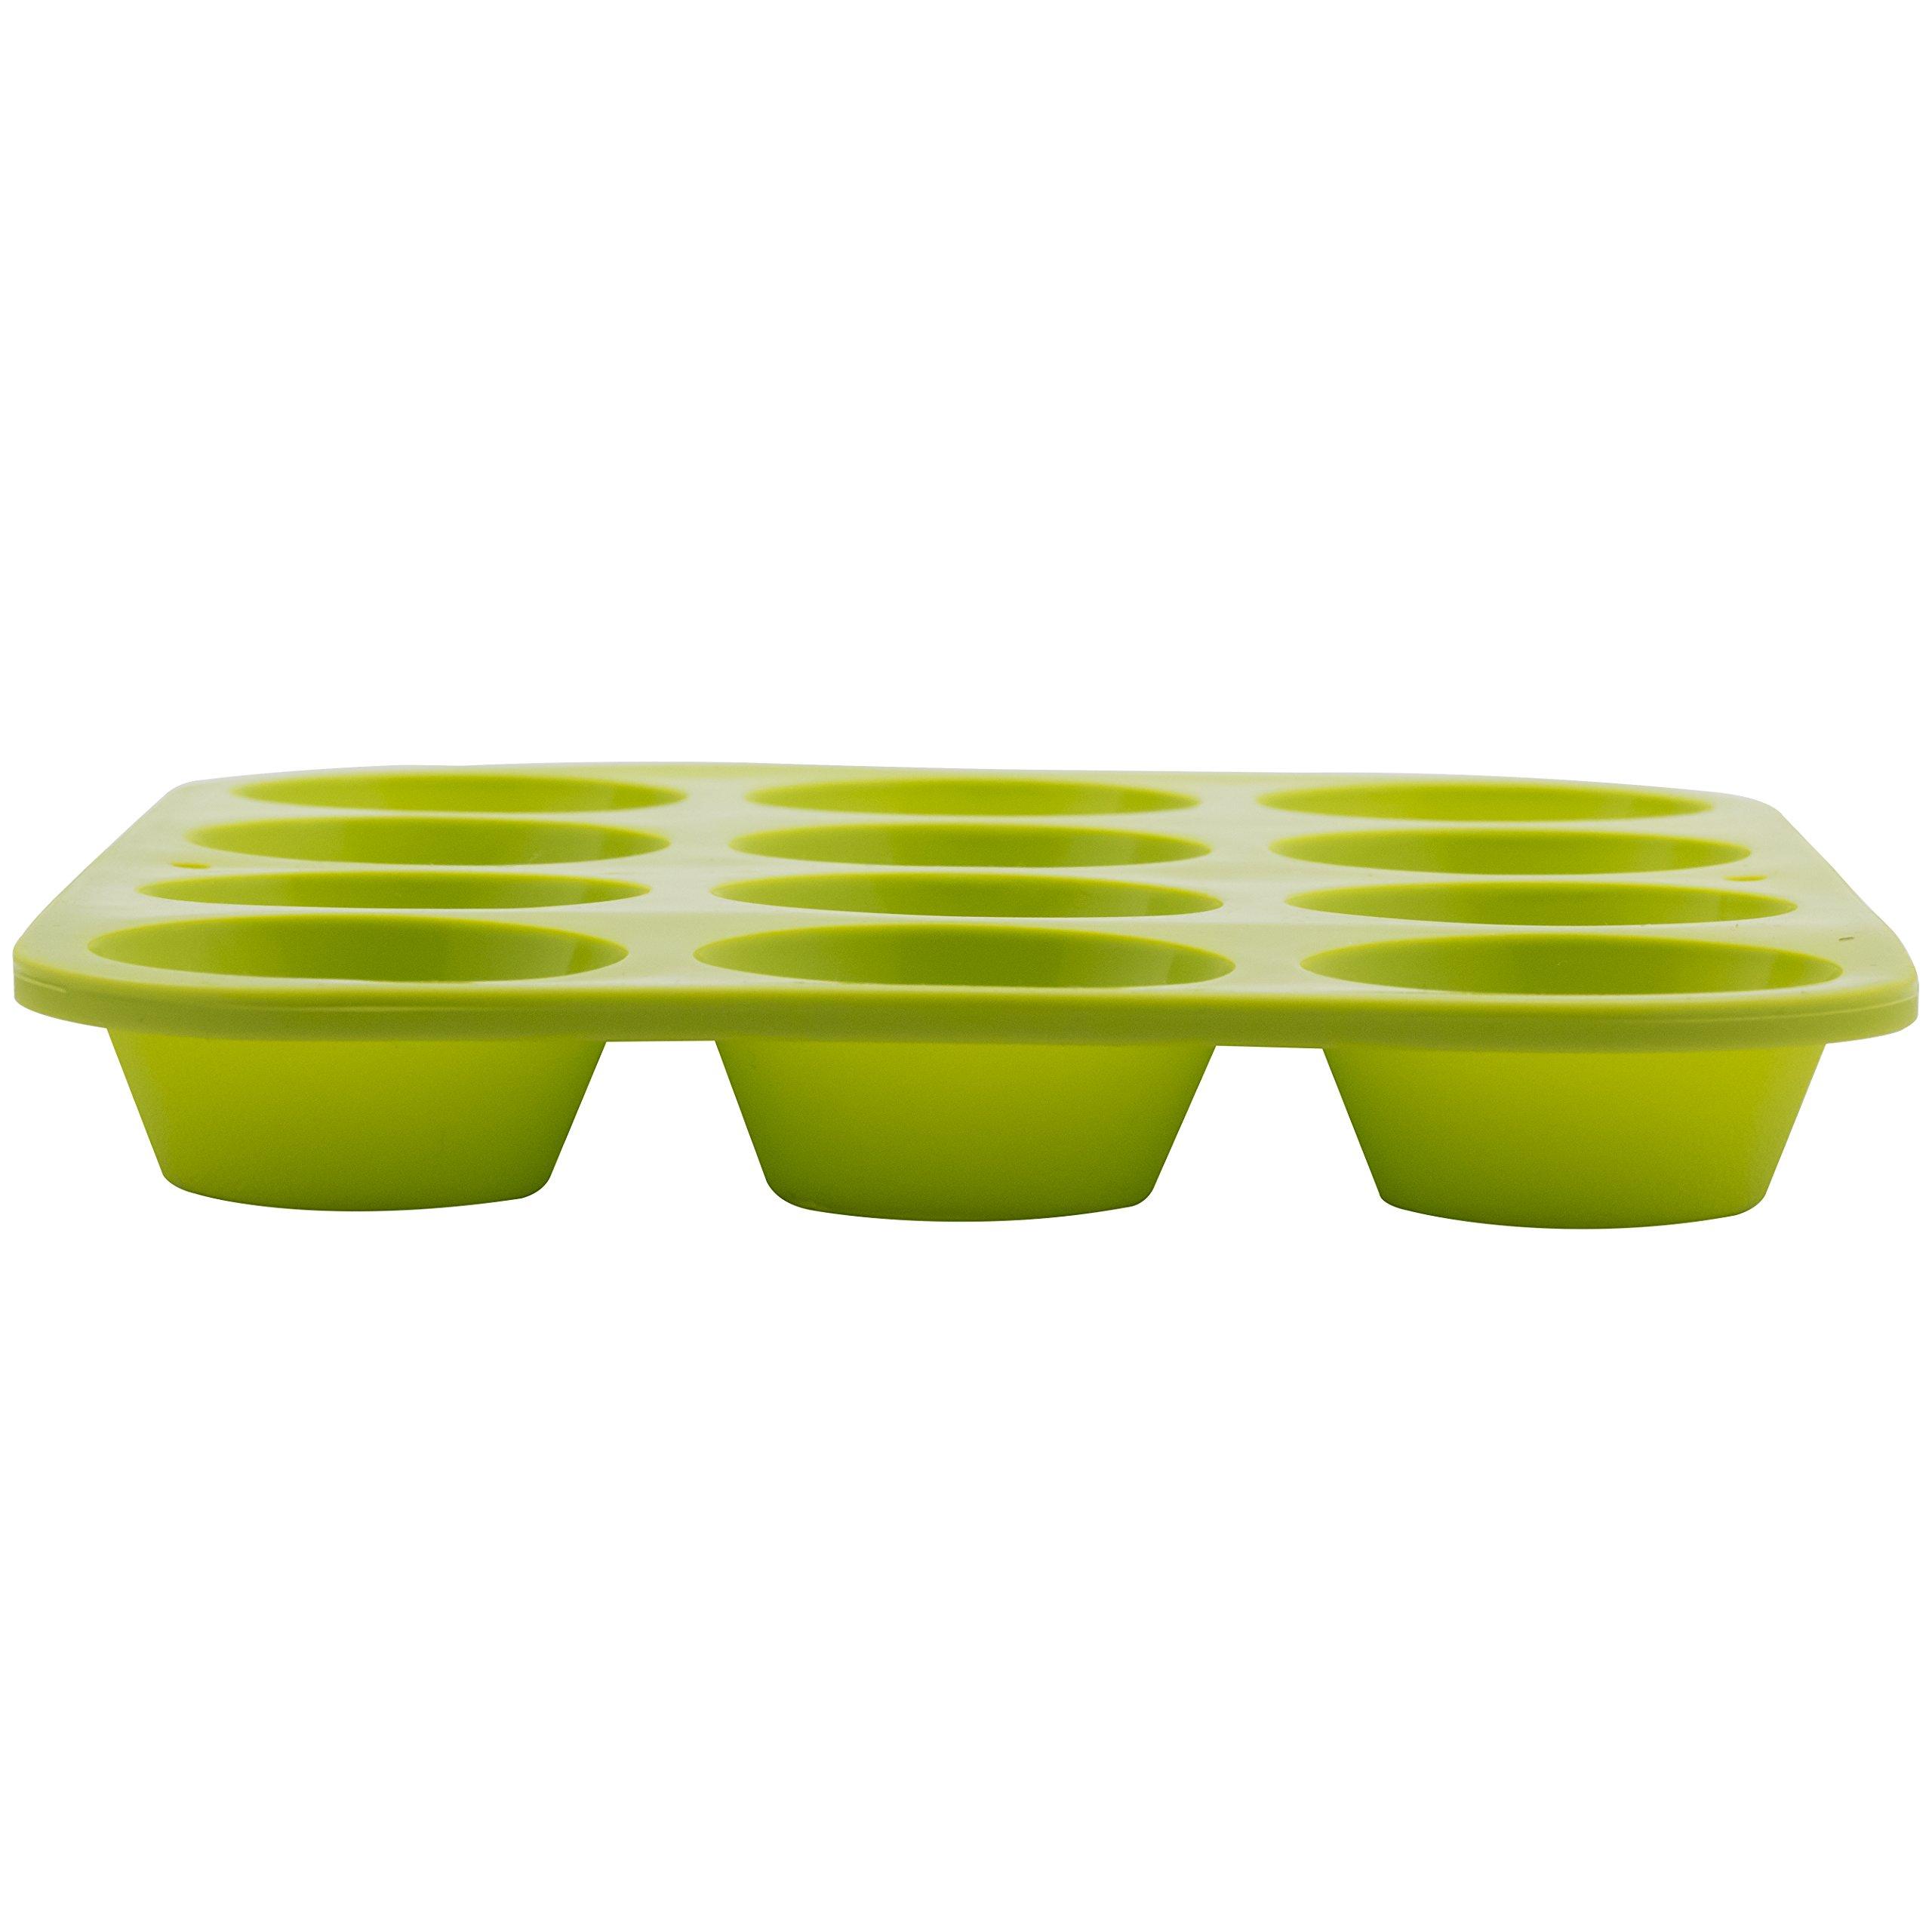 Marathon Housewares KW200011GR Premium Silicone 12 Cup Mini Muffin Pan, Green by Marathon Housewares (Image #3)